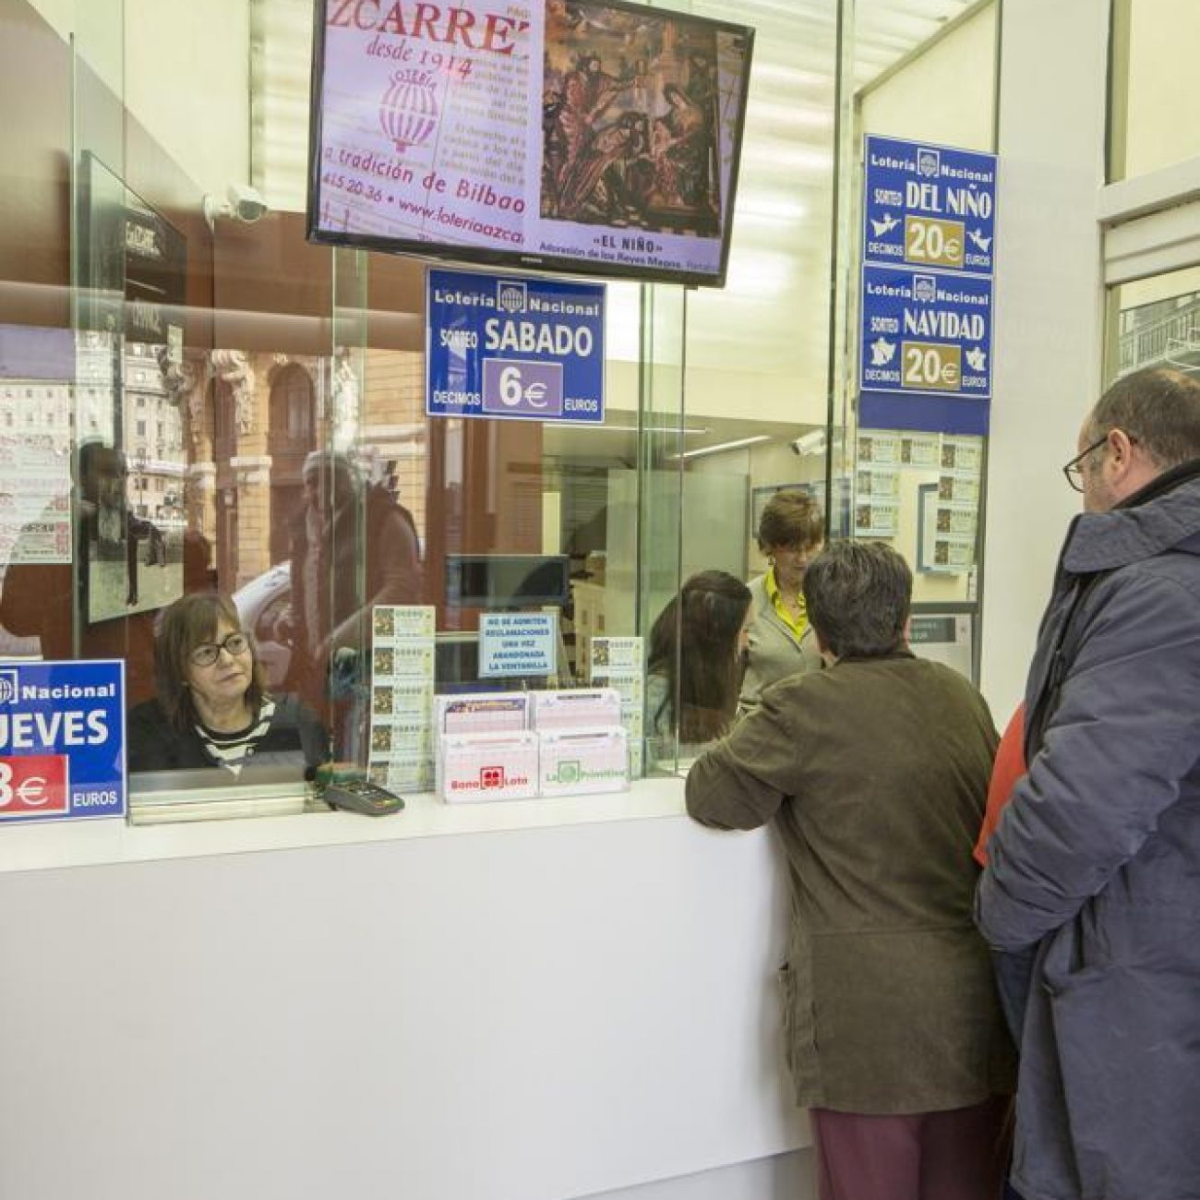 3963-loteria-azcarreta-03